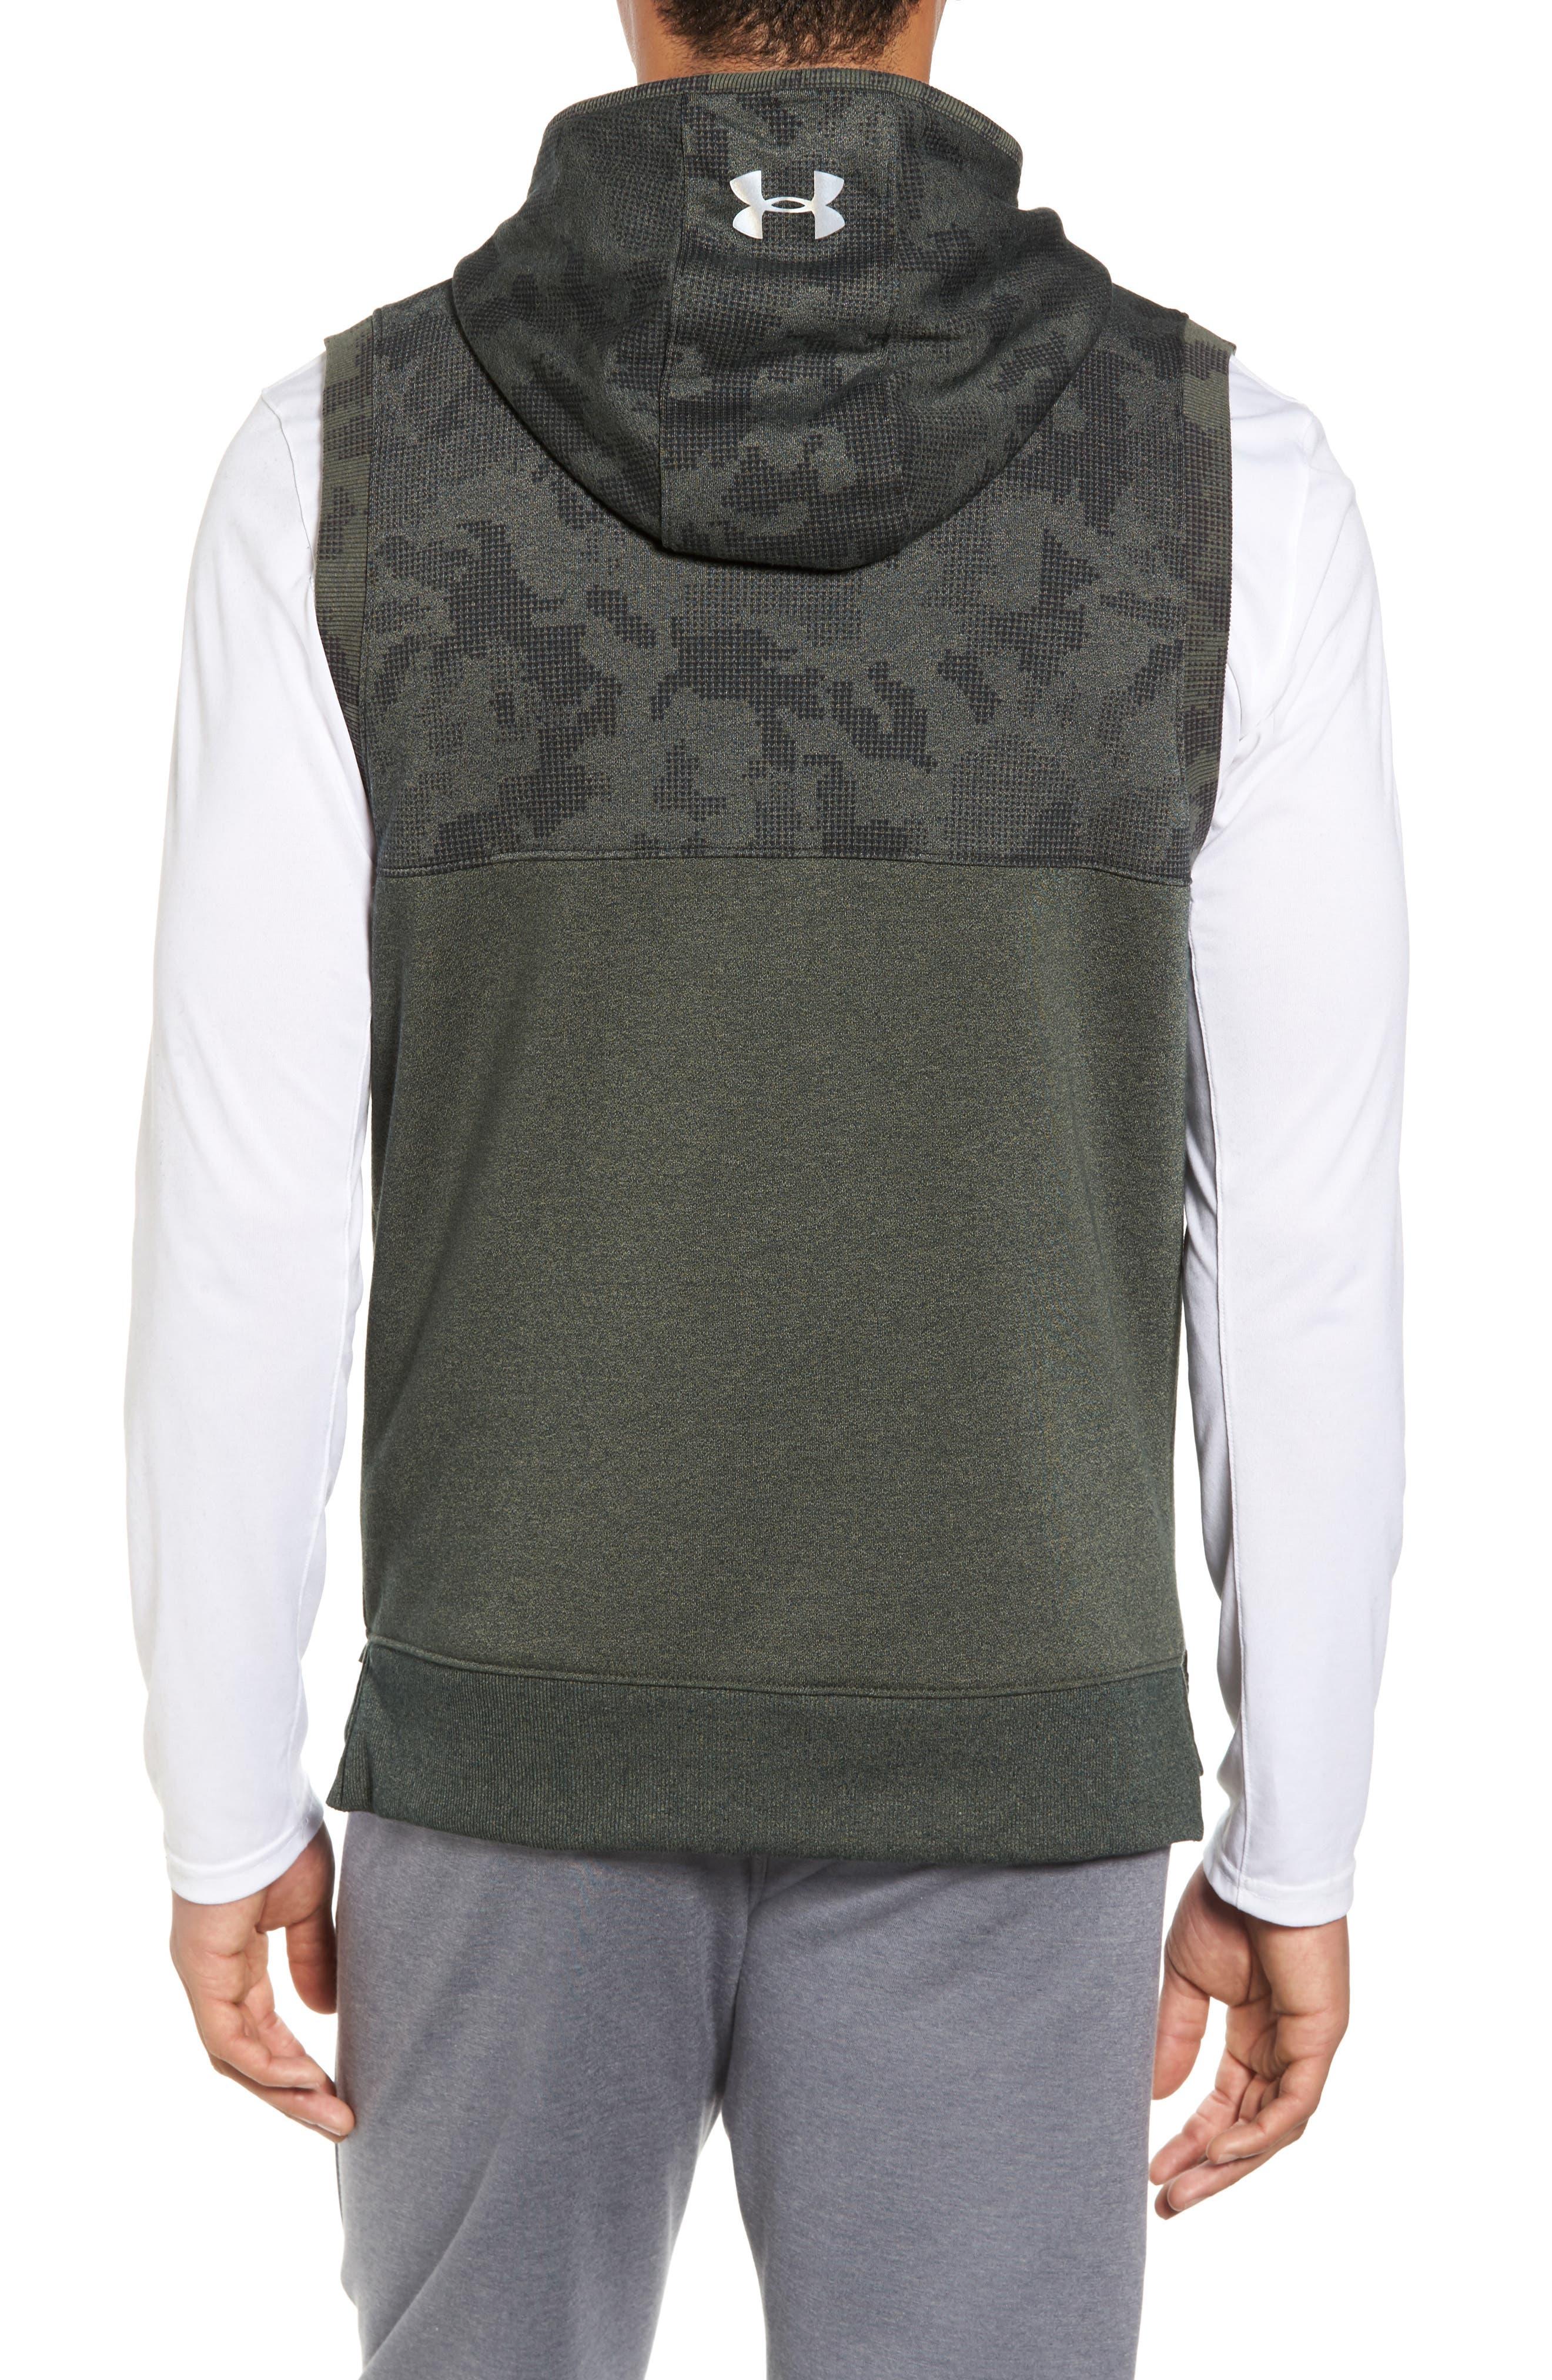 Threadborne Hooded Vest,                             Alternate thumbnail 2, color,                             Downtown Green / Refletive